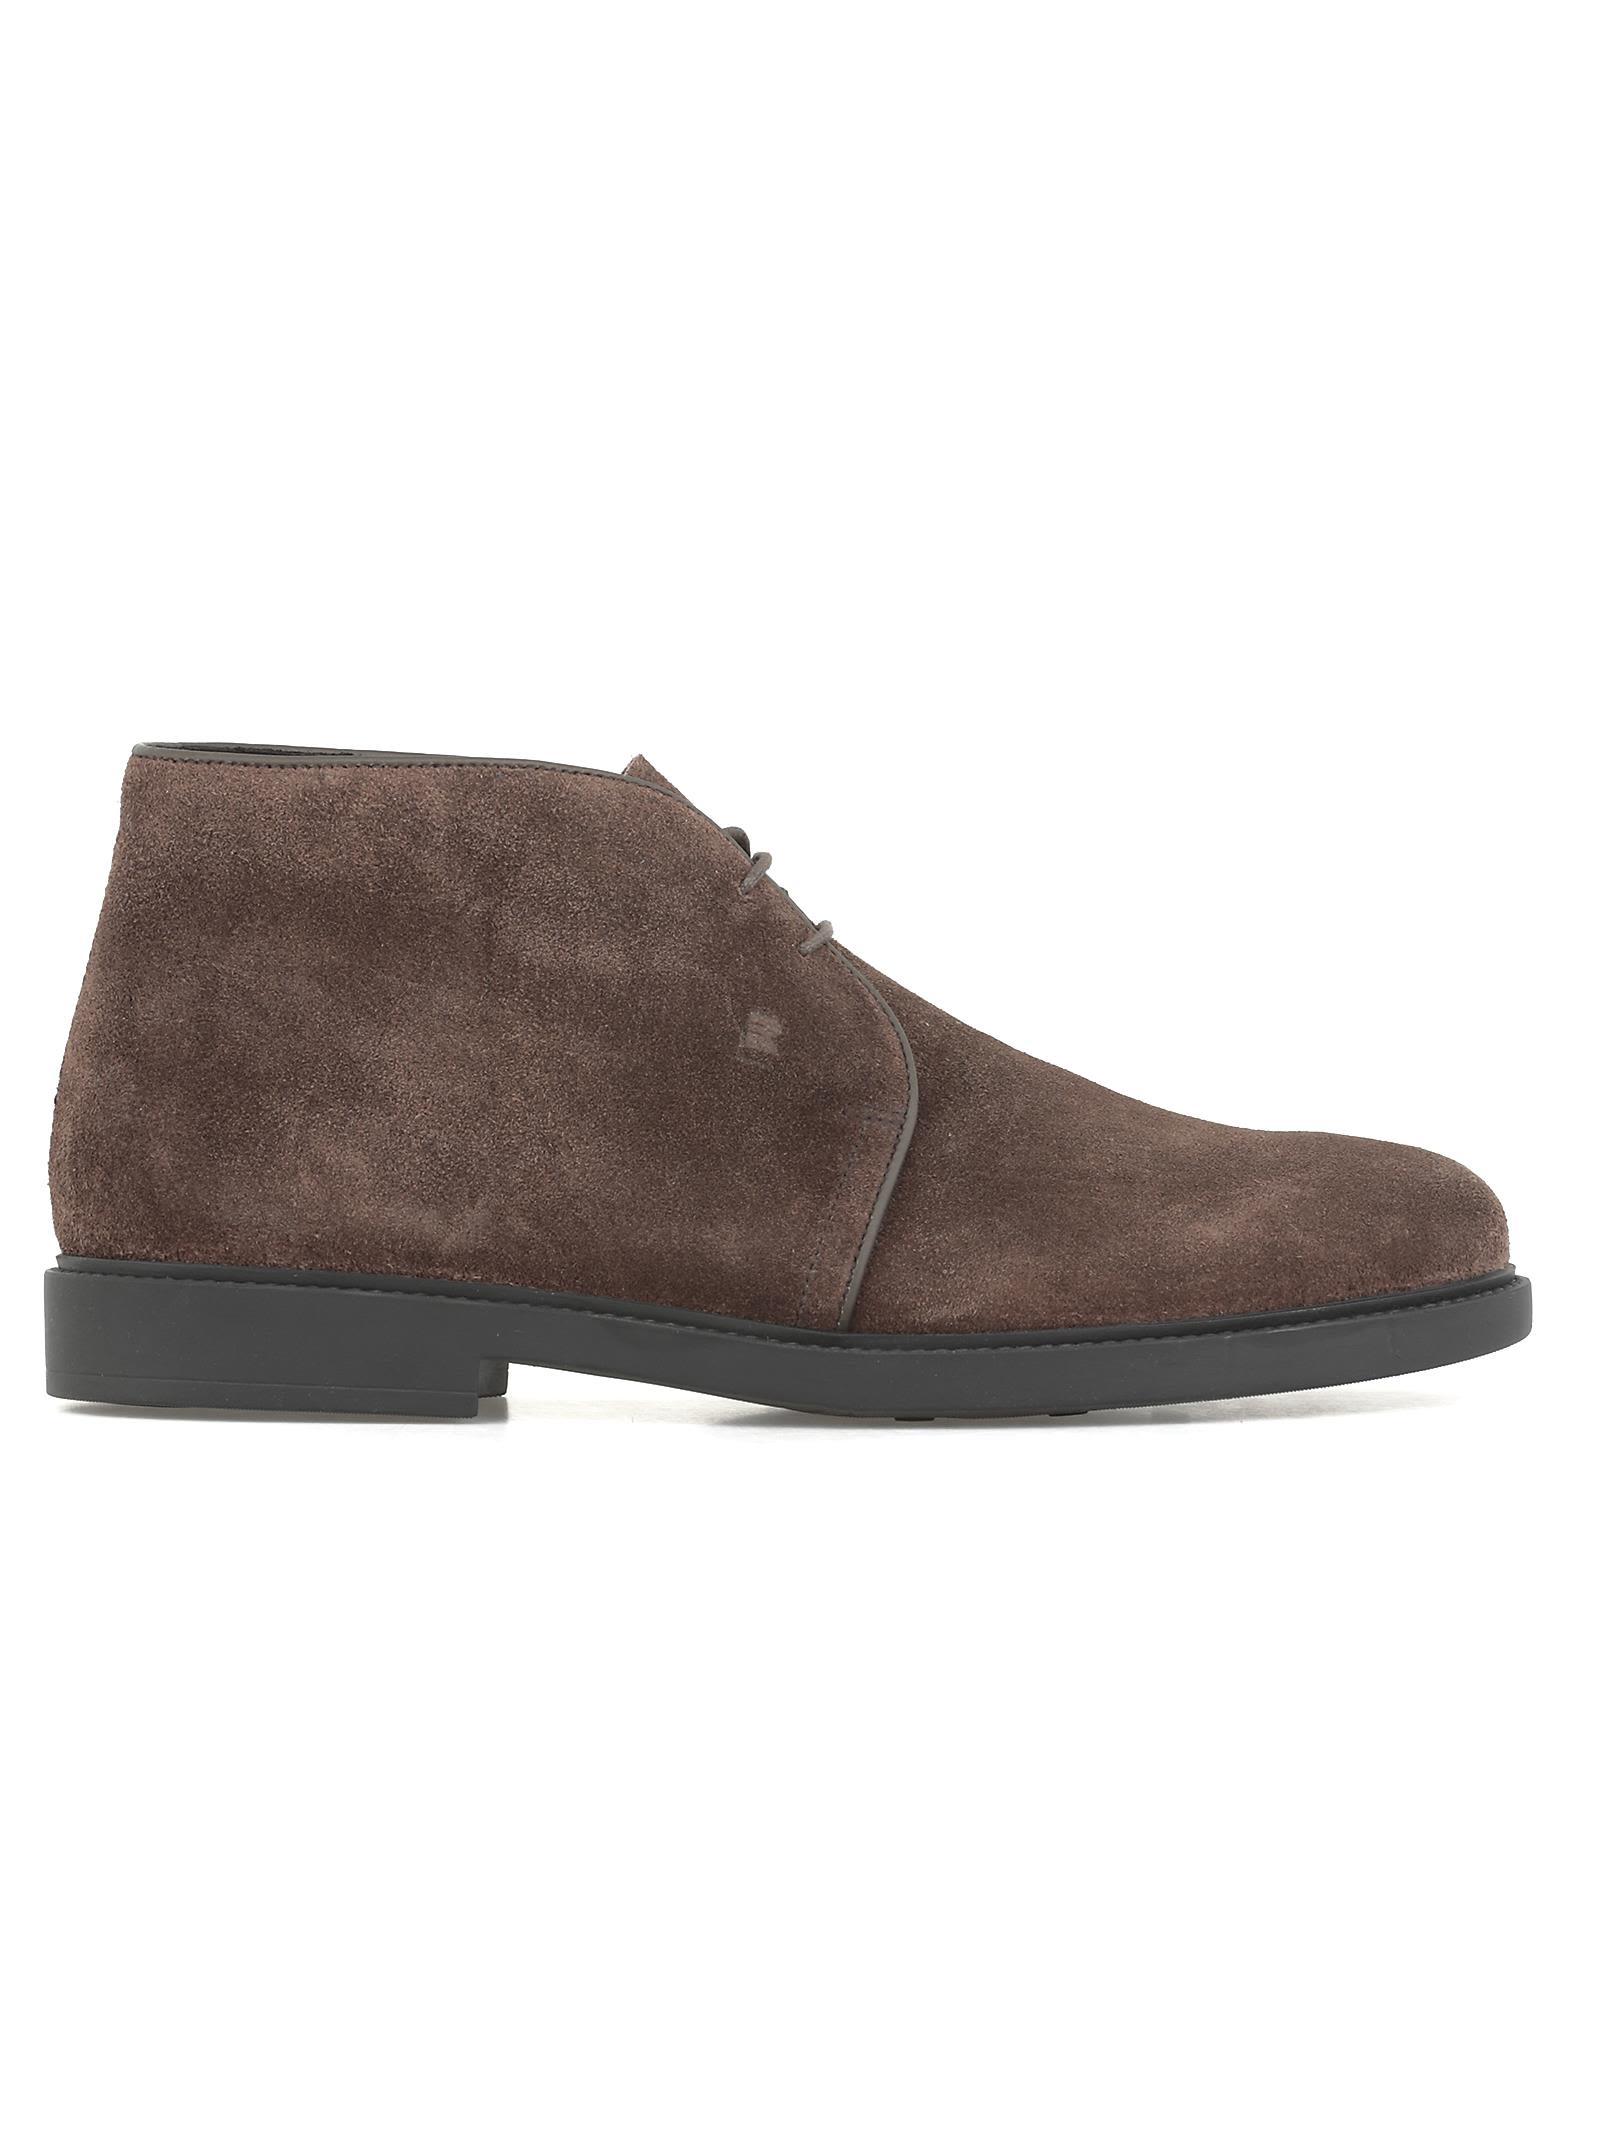 FRATELLI ROSSETTI Leather Desert Boot in Brown